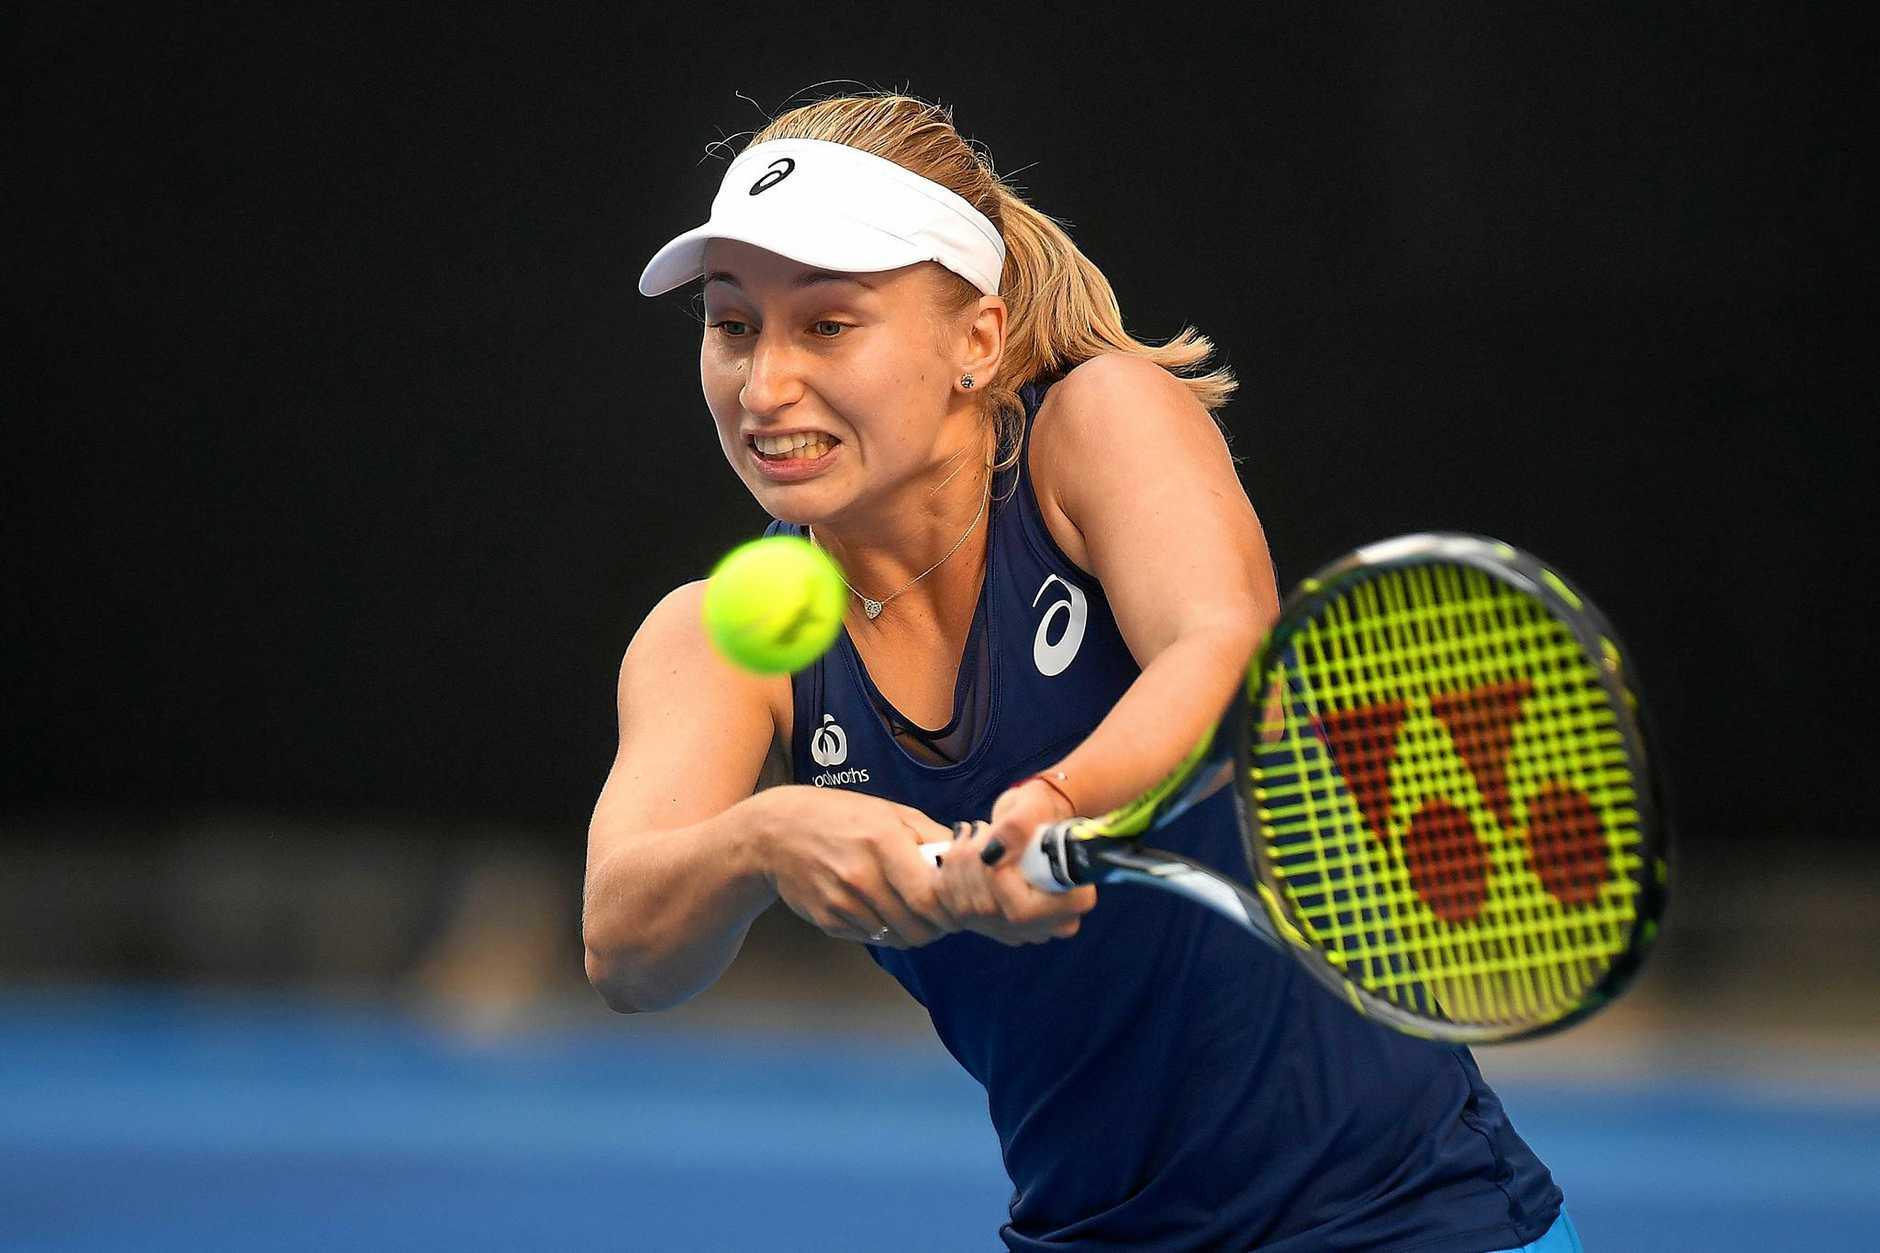 Daria Gavrilova of Australia in action against Ana Konjuh of Croatia